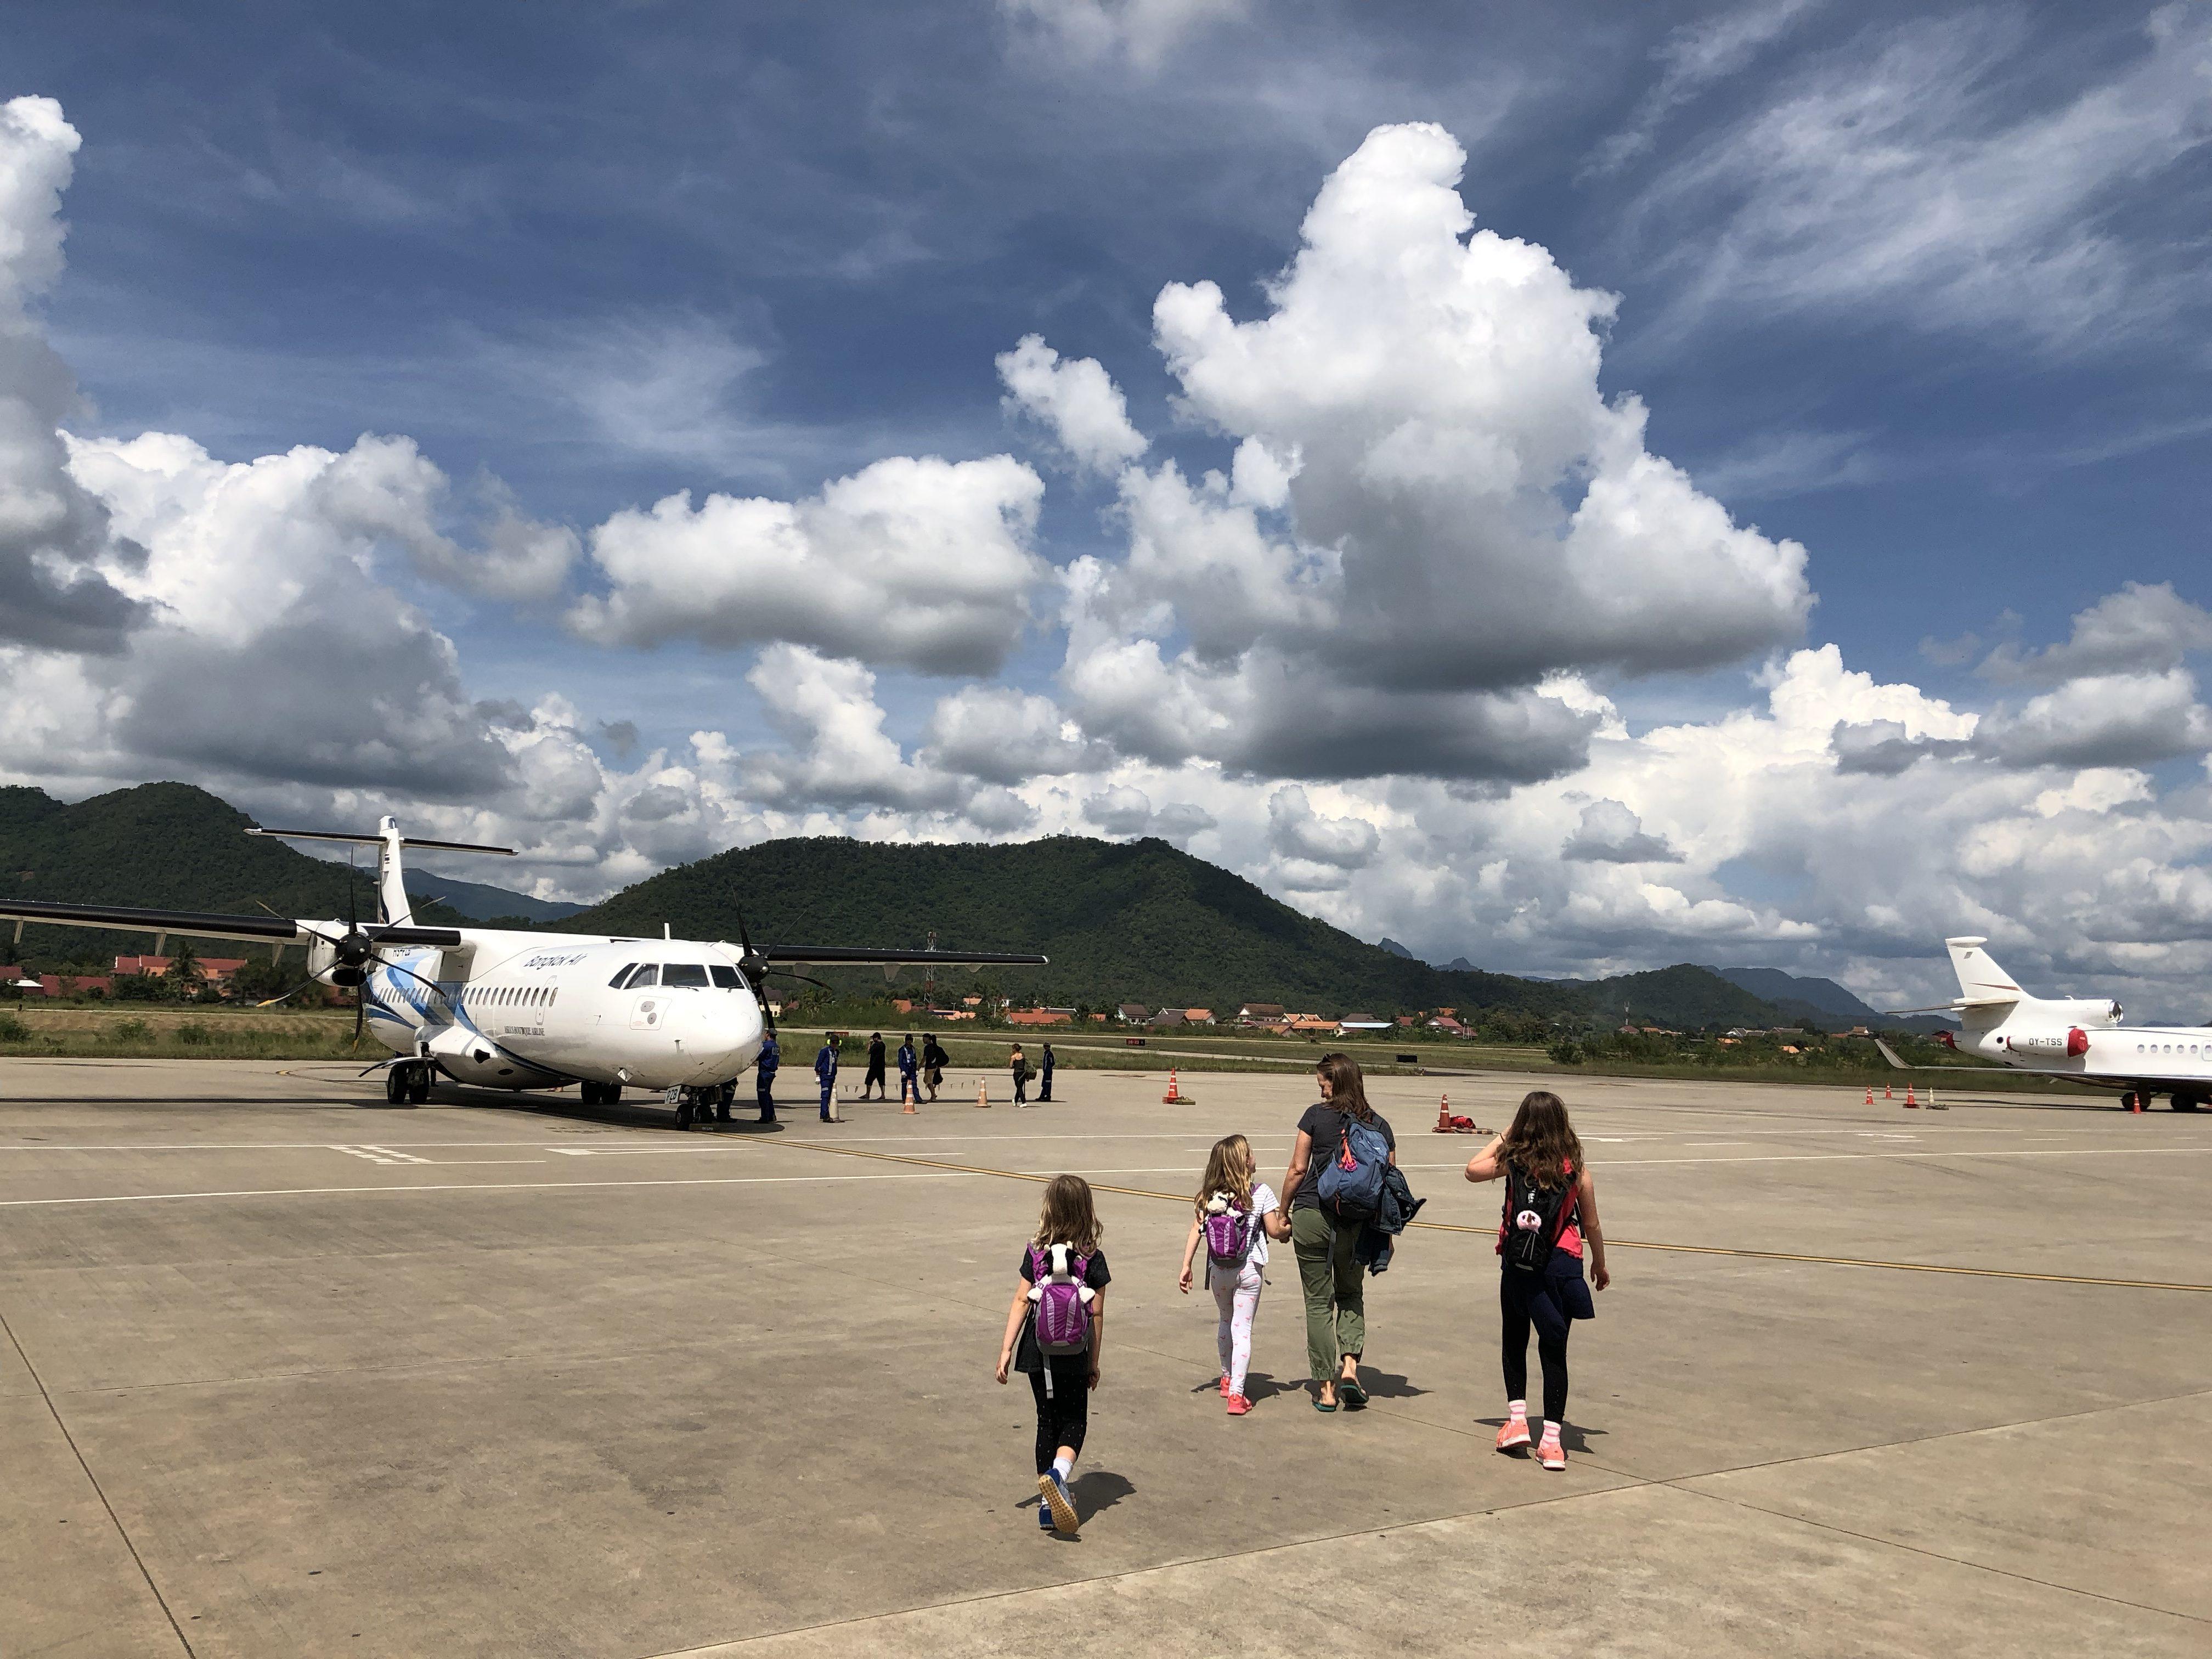 Boarding the plane in Borneo, as you do.